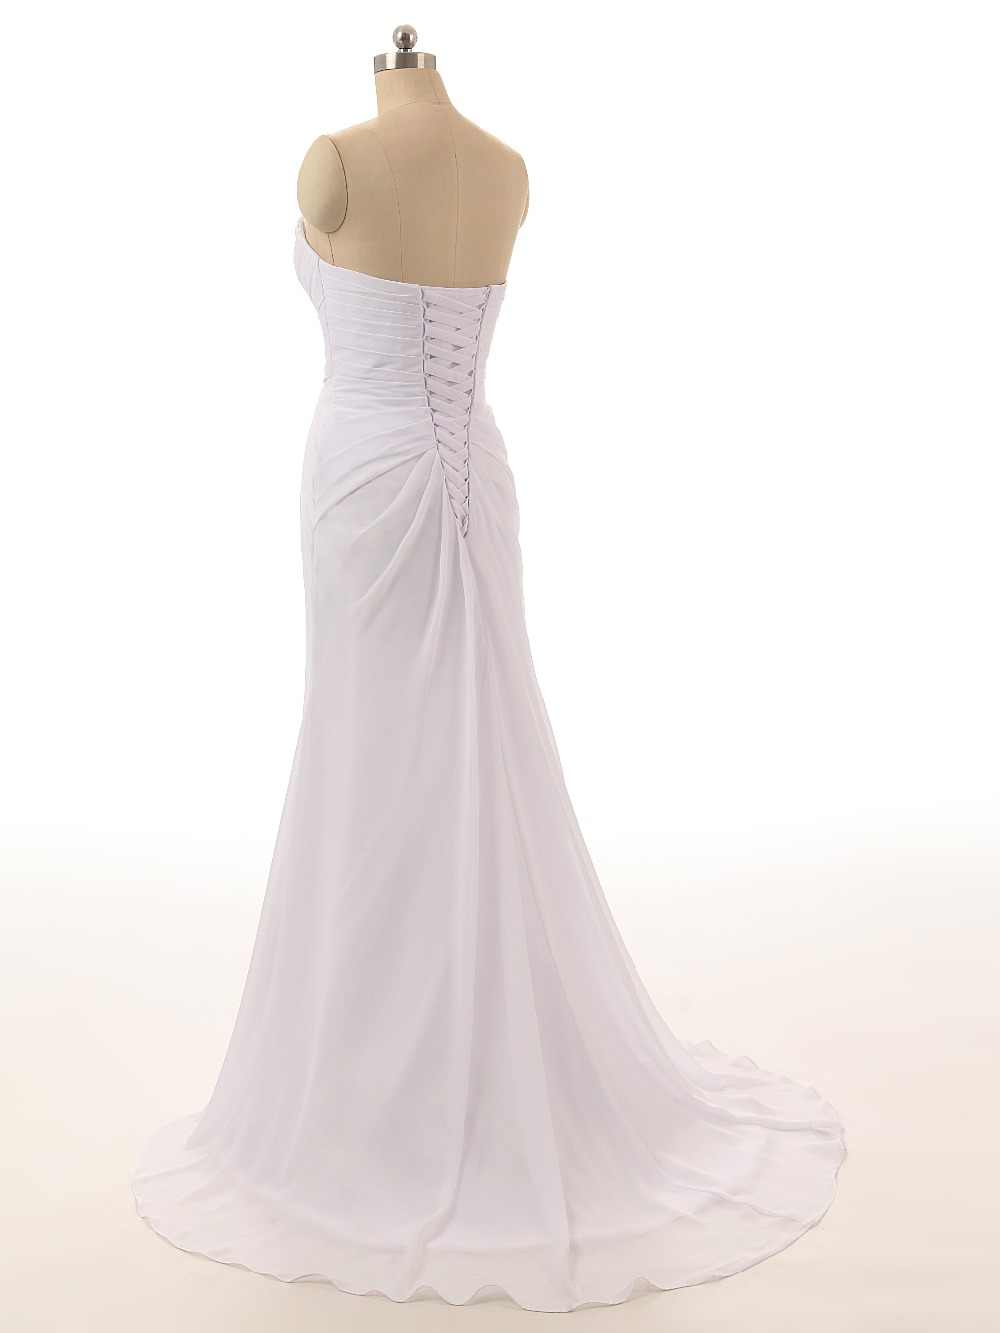 Vestidos de noiva da princesa da sereia do vintage 2017 trouwjurk rendas até trás vestido de noiva da princesa luxo árabe